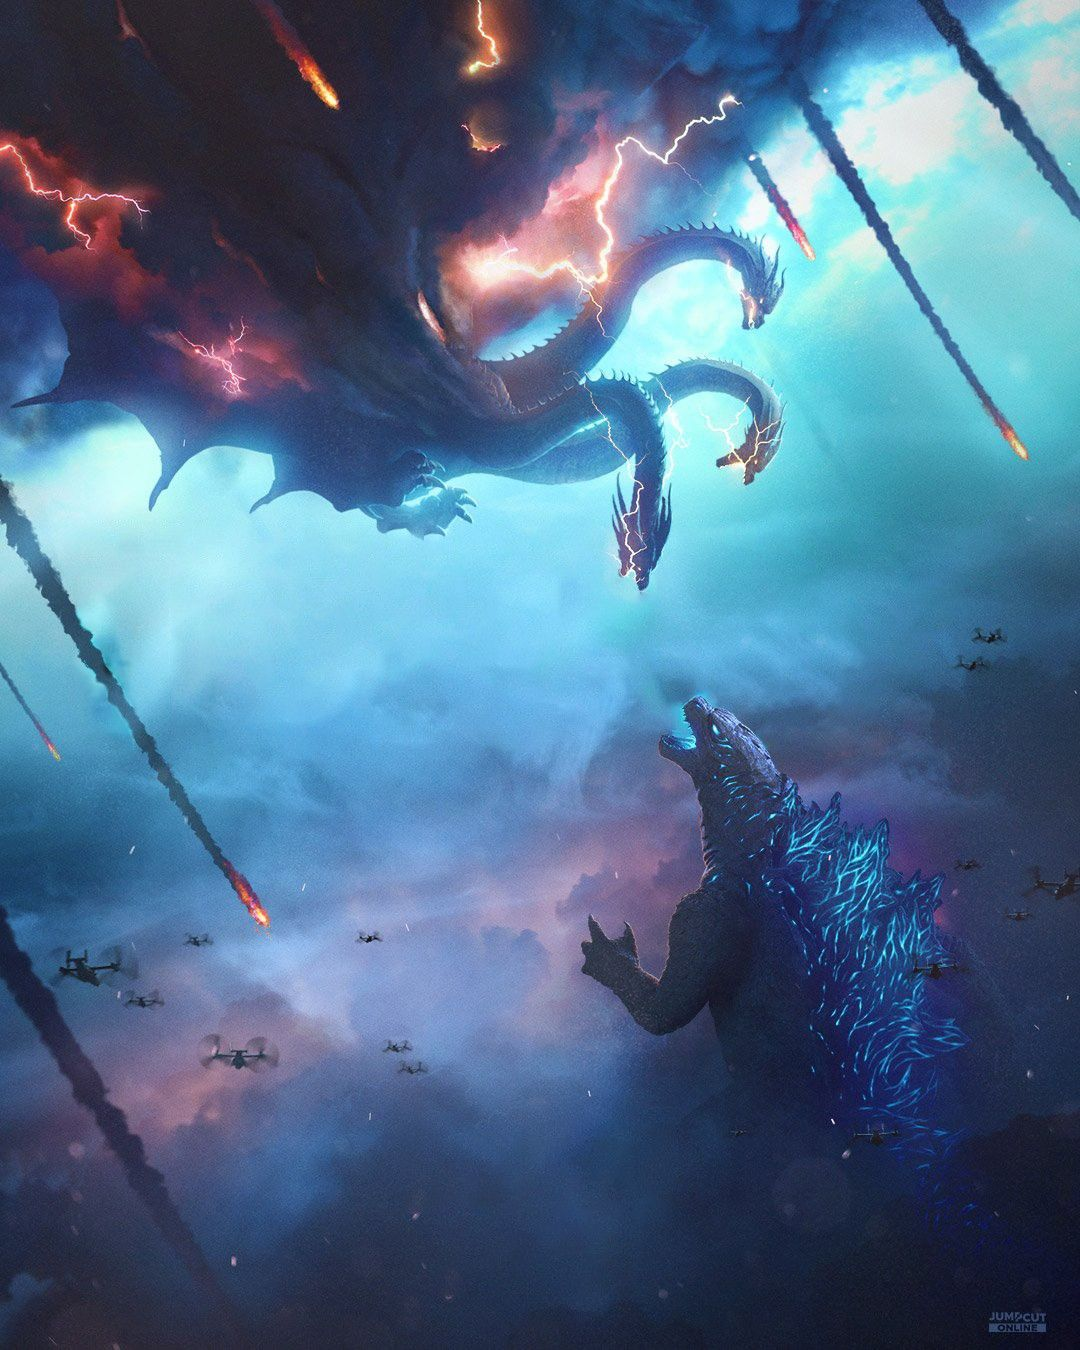 Ghidorah Vs Godzilla Godzilla Godzilla Wallpaper All Godzilla